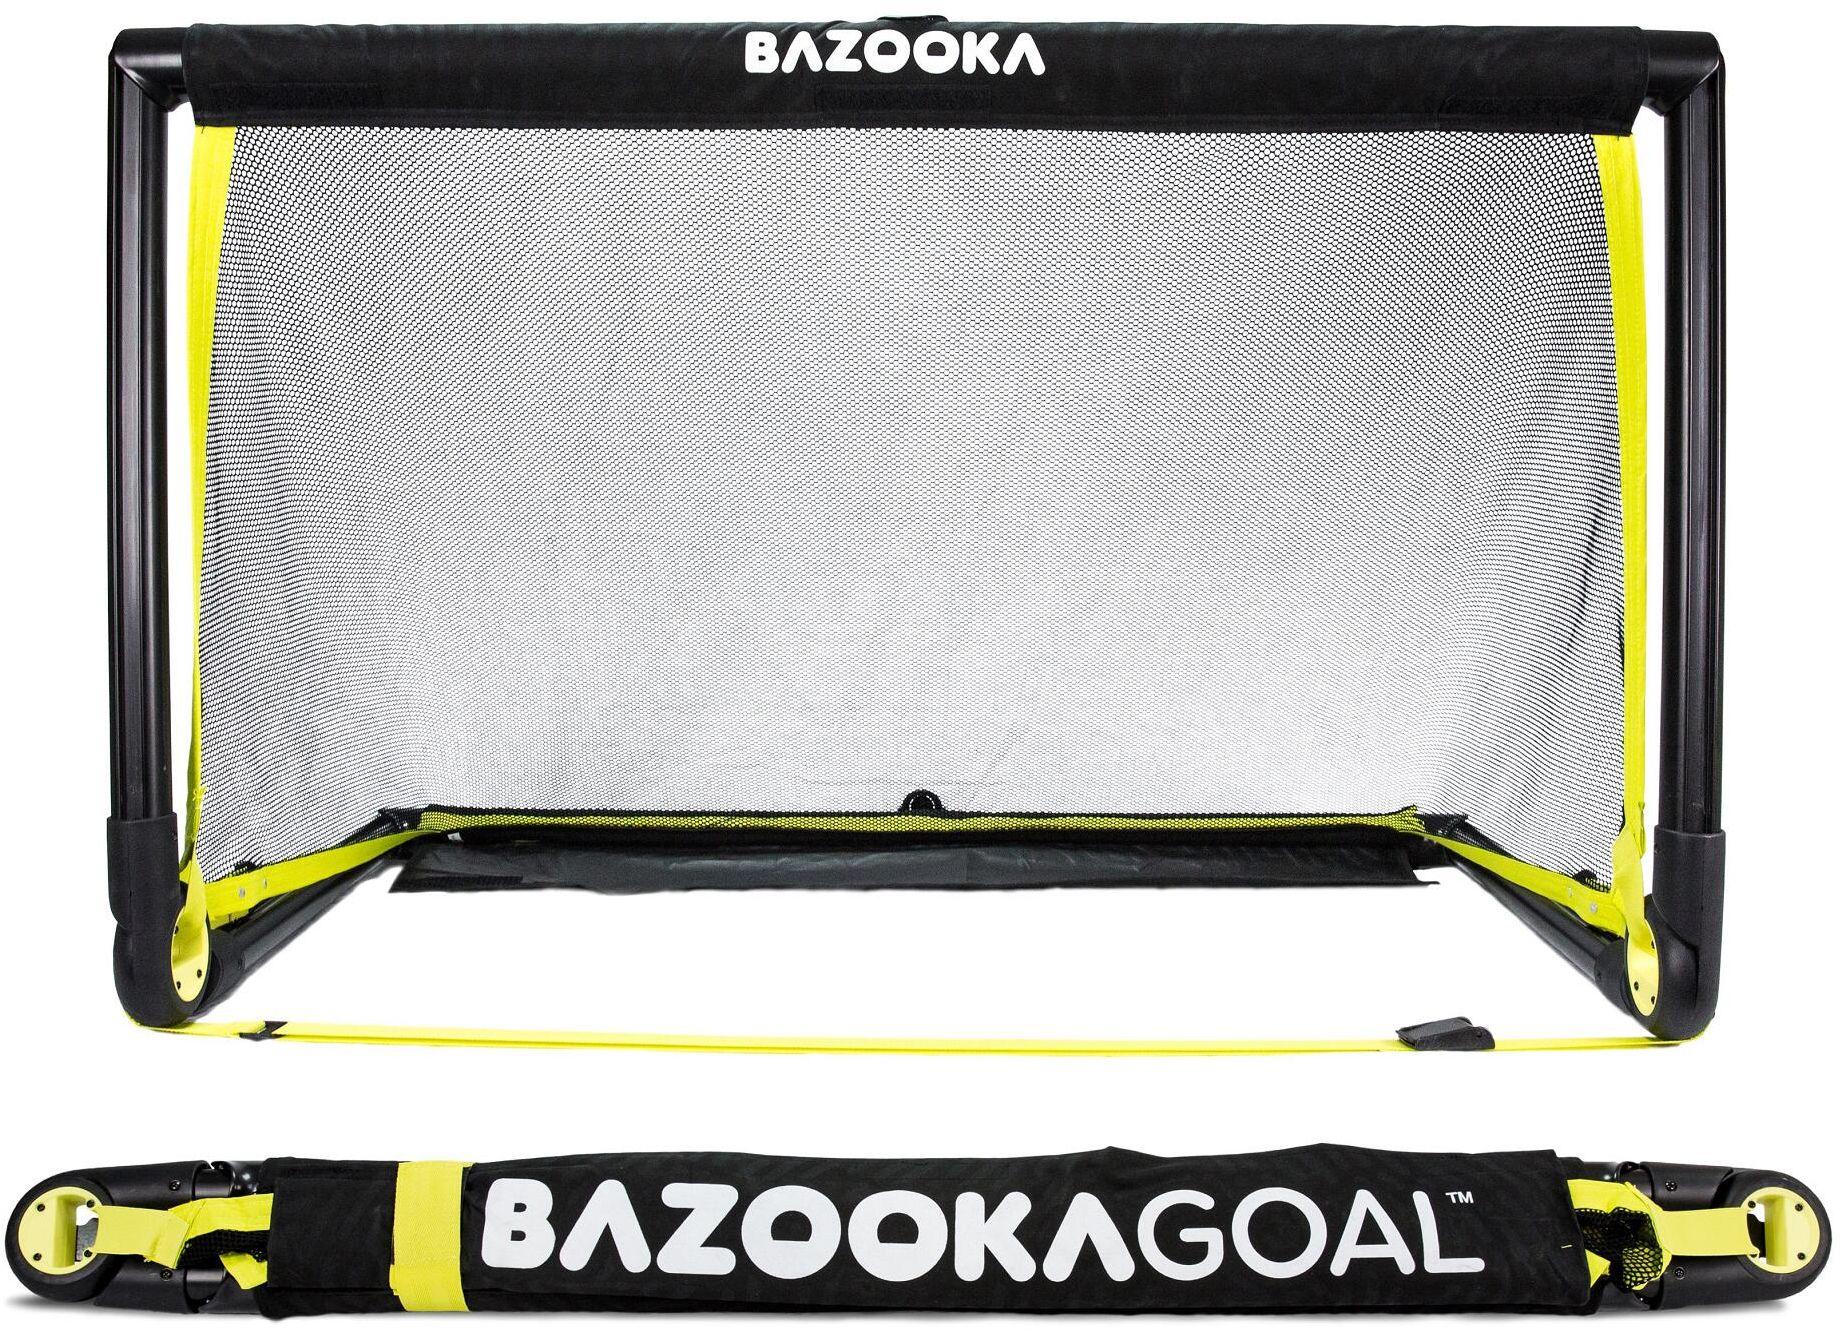 Bramka piłkarska BAZOOKAGOAL 120x75 czarna składana